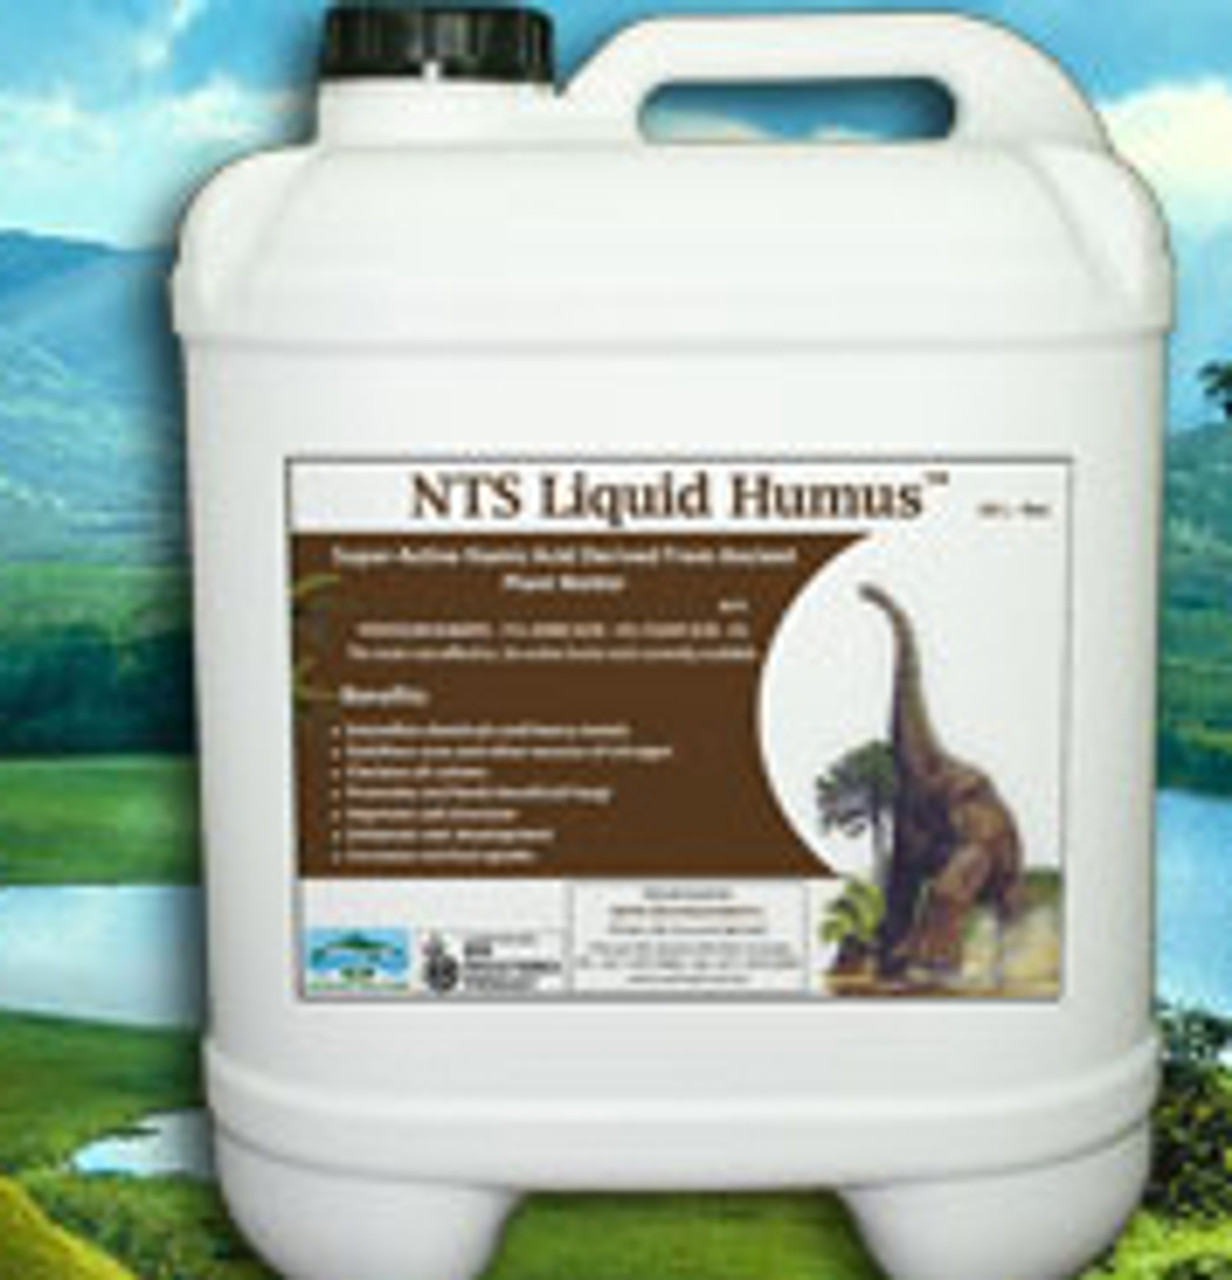 NTS Liquid Humus suitable for compost tea brewing